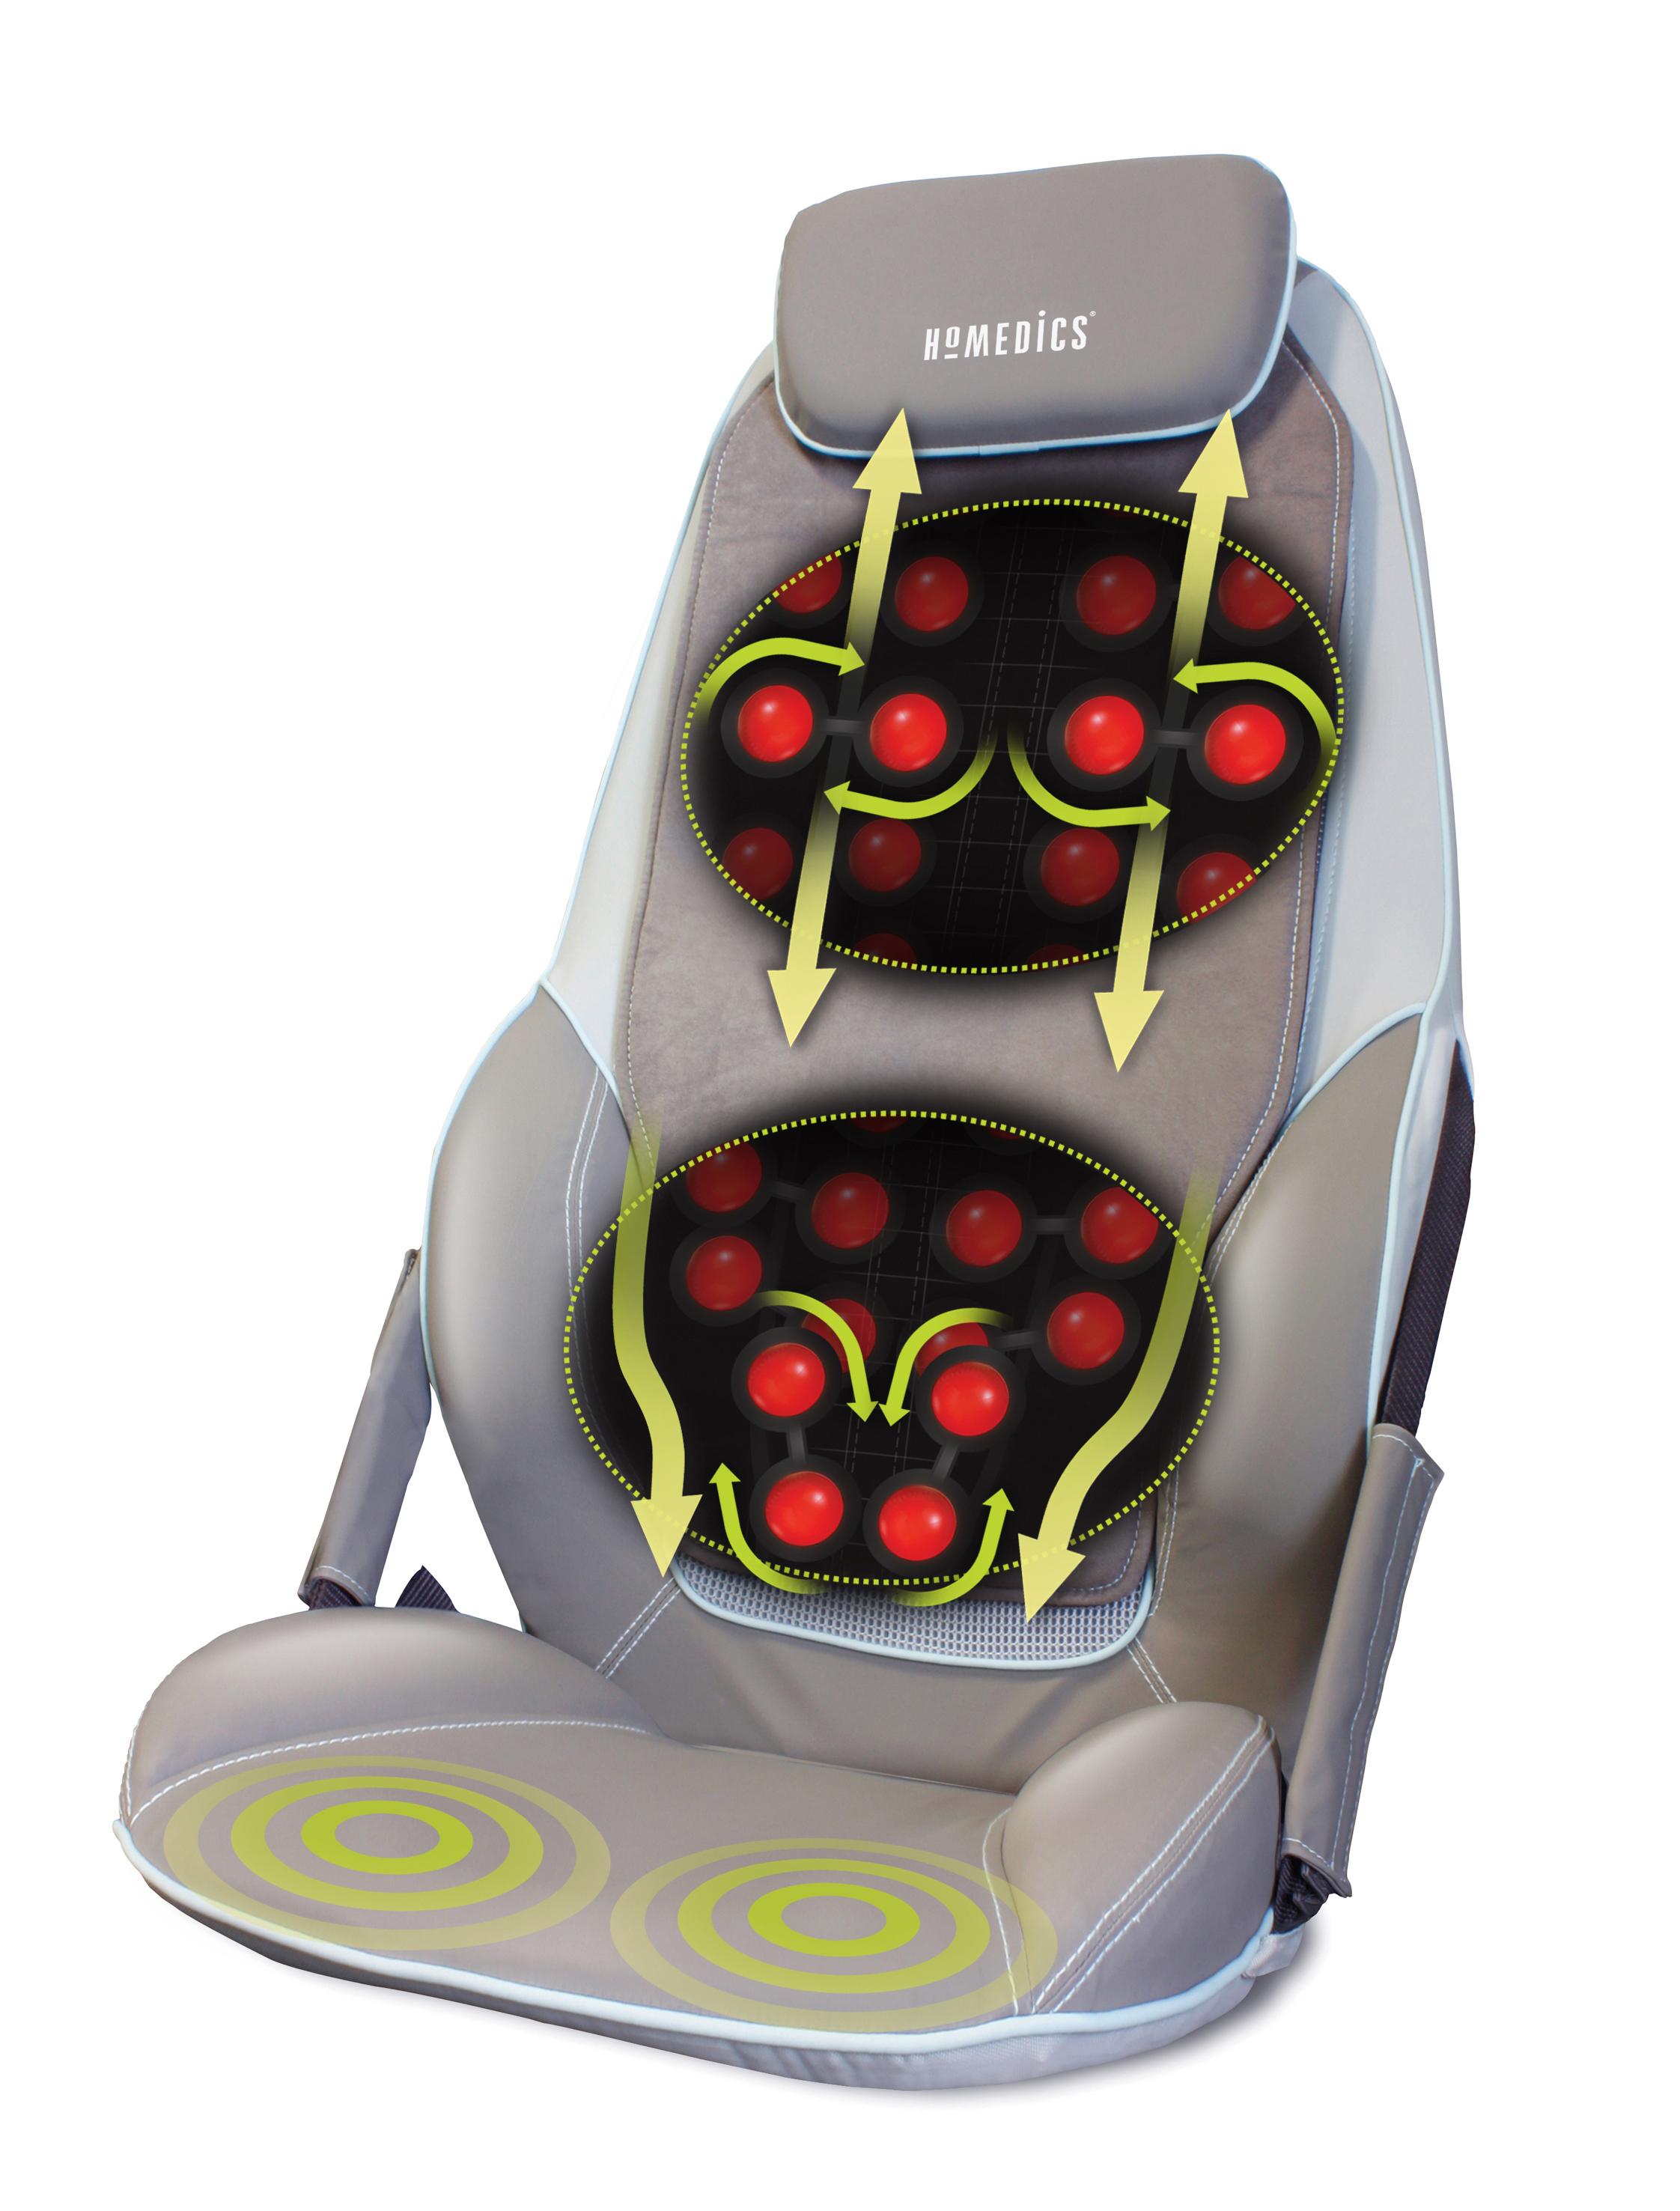 homedics shiatsu max massager back and shoulder massager chair